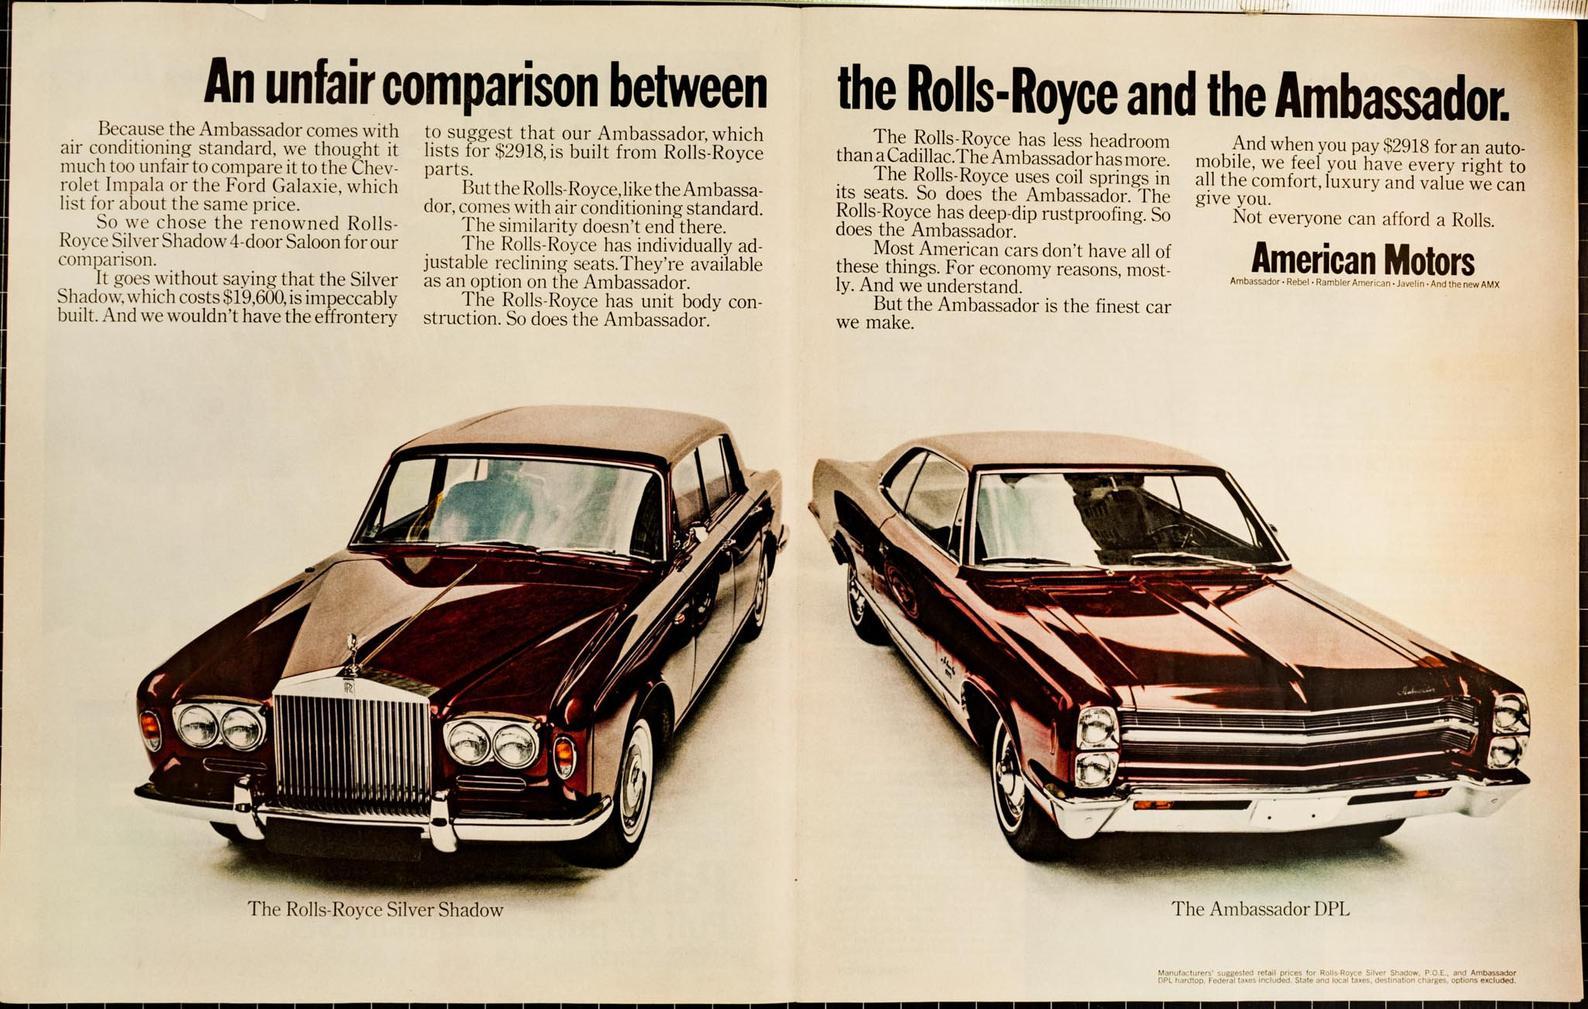 1968 AMC Ambassador vs Rolls-Royce Silver Shadow